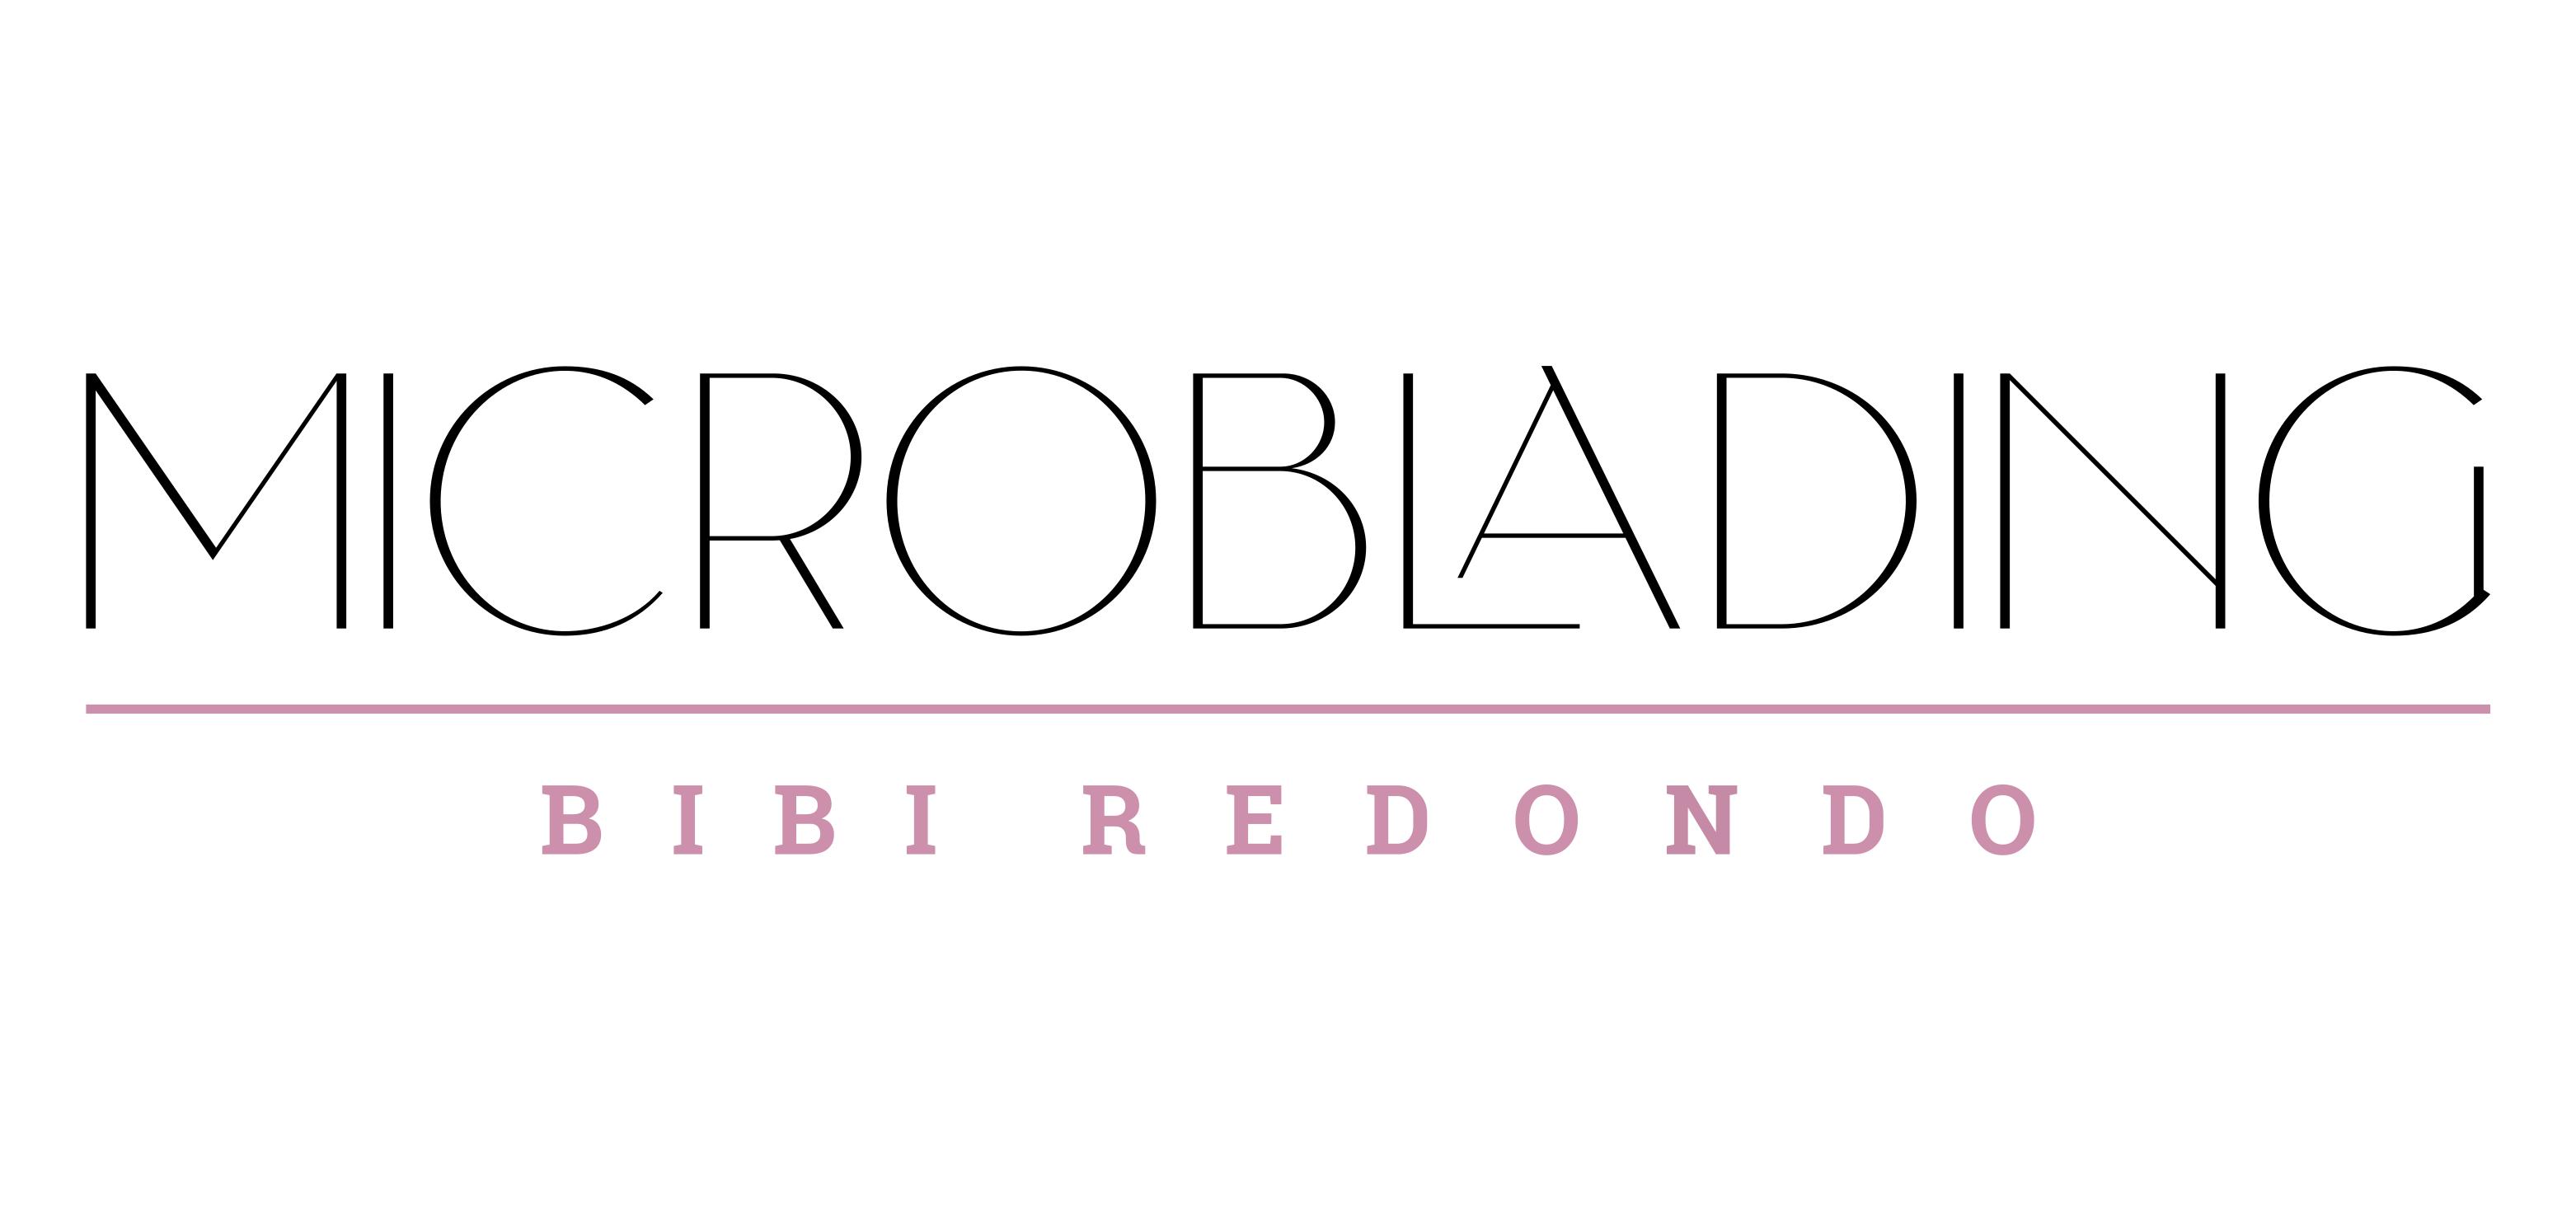 Bibi Redondo Microblading